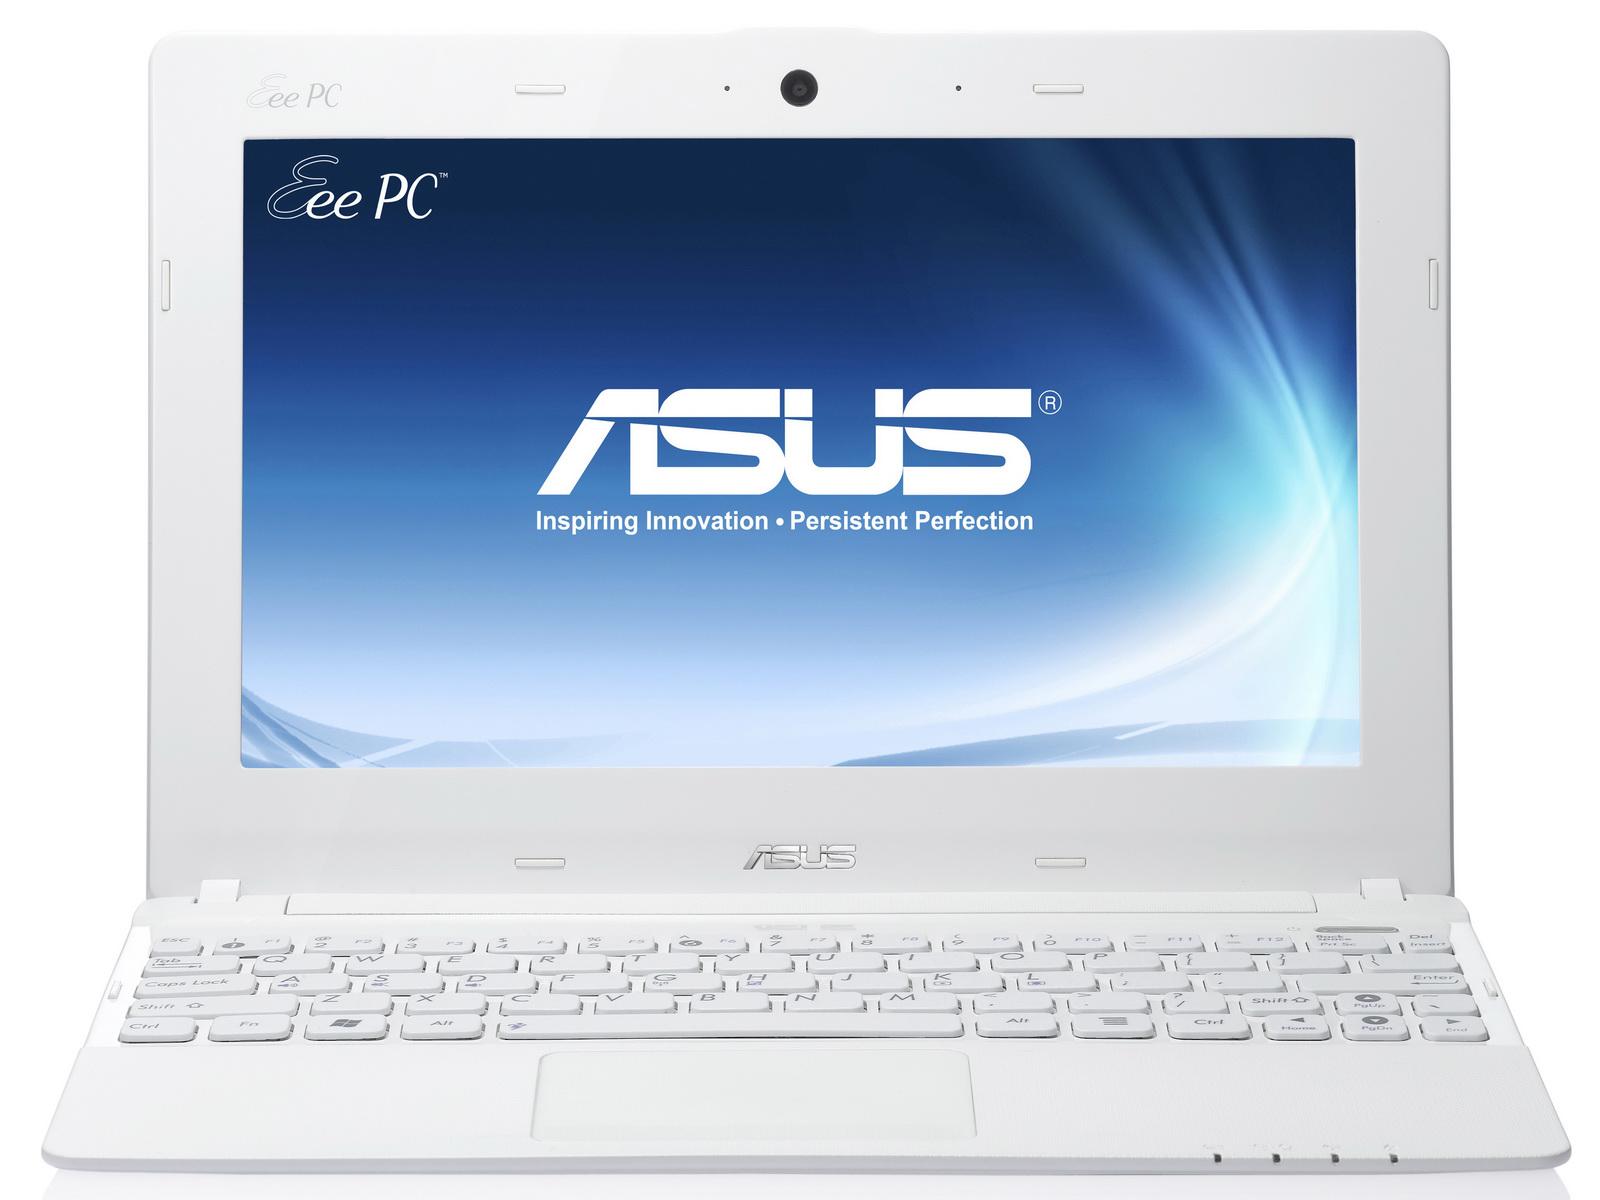 Asus Eee PC 1001PXD Netbook Intel Pineview Display Windows 7 64-BIT